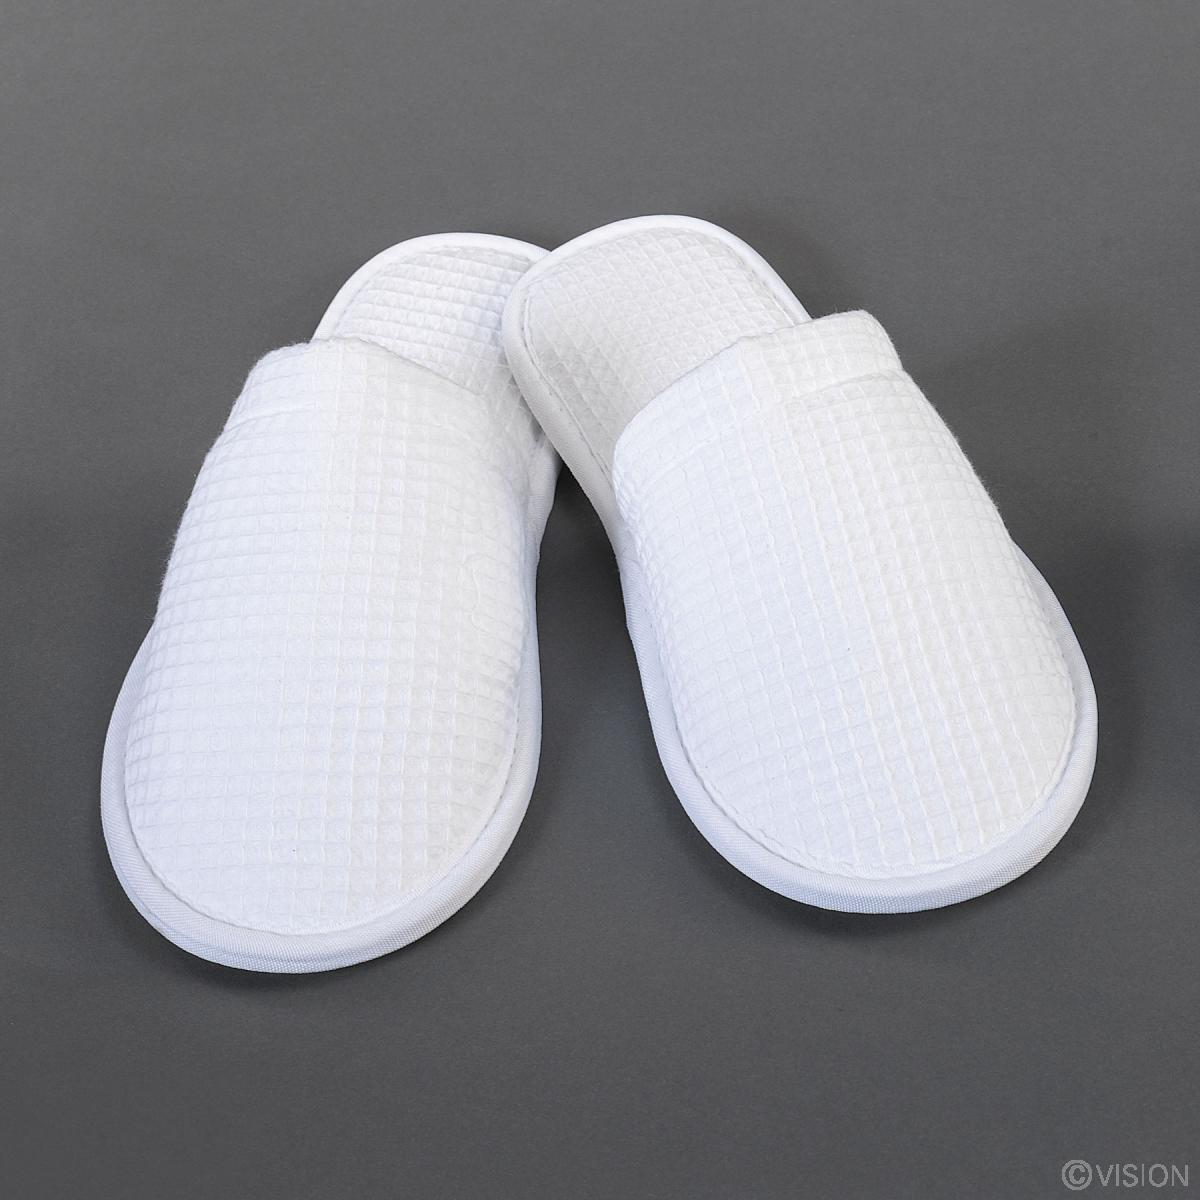 Luxury White Waffle Slippers For Hotel Amp Spa Use